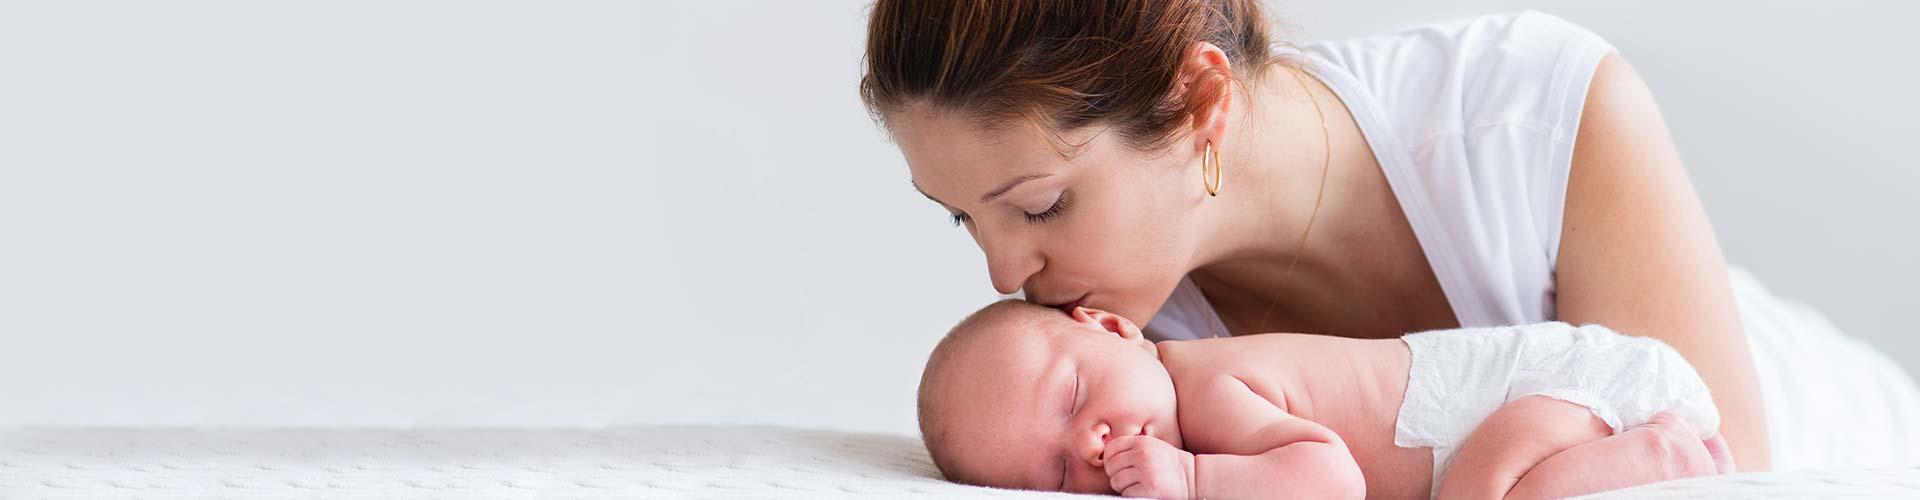 Woman kissing her newborn baby.